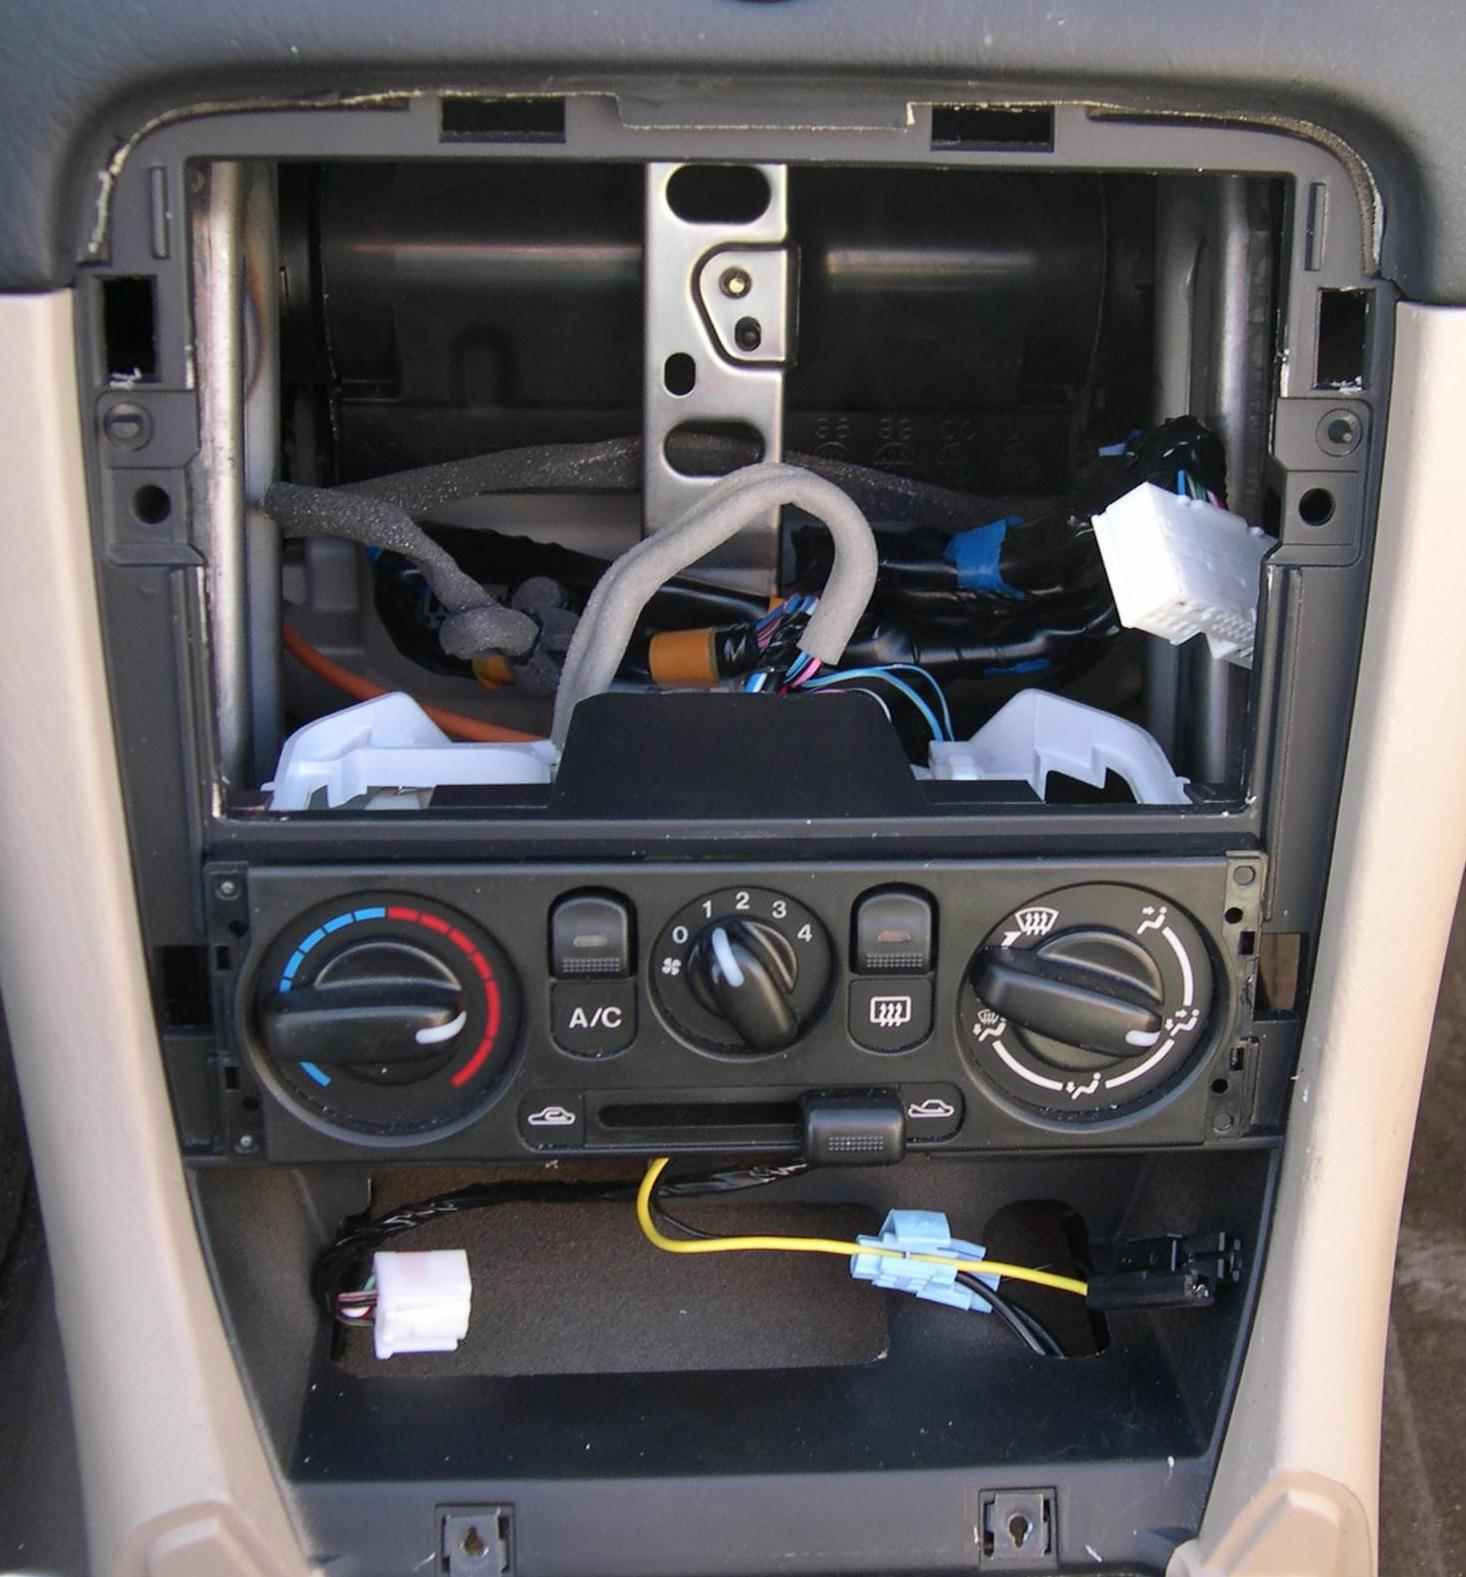 mazda 626 wiring diagram er for car insurance company the nb oem audio system faq 2001 radio out photo stephen foskett